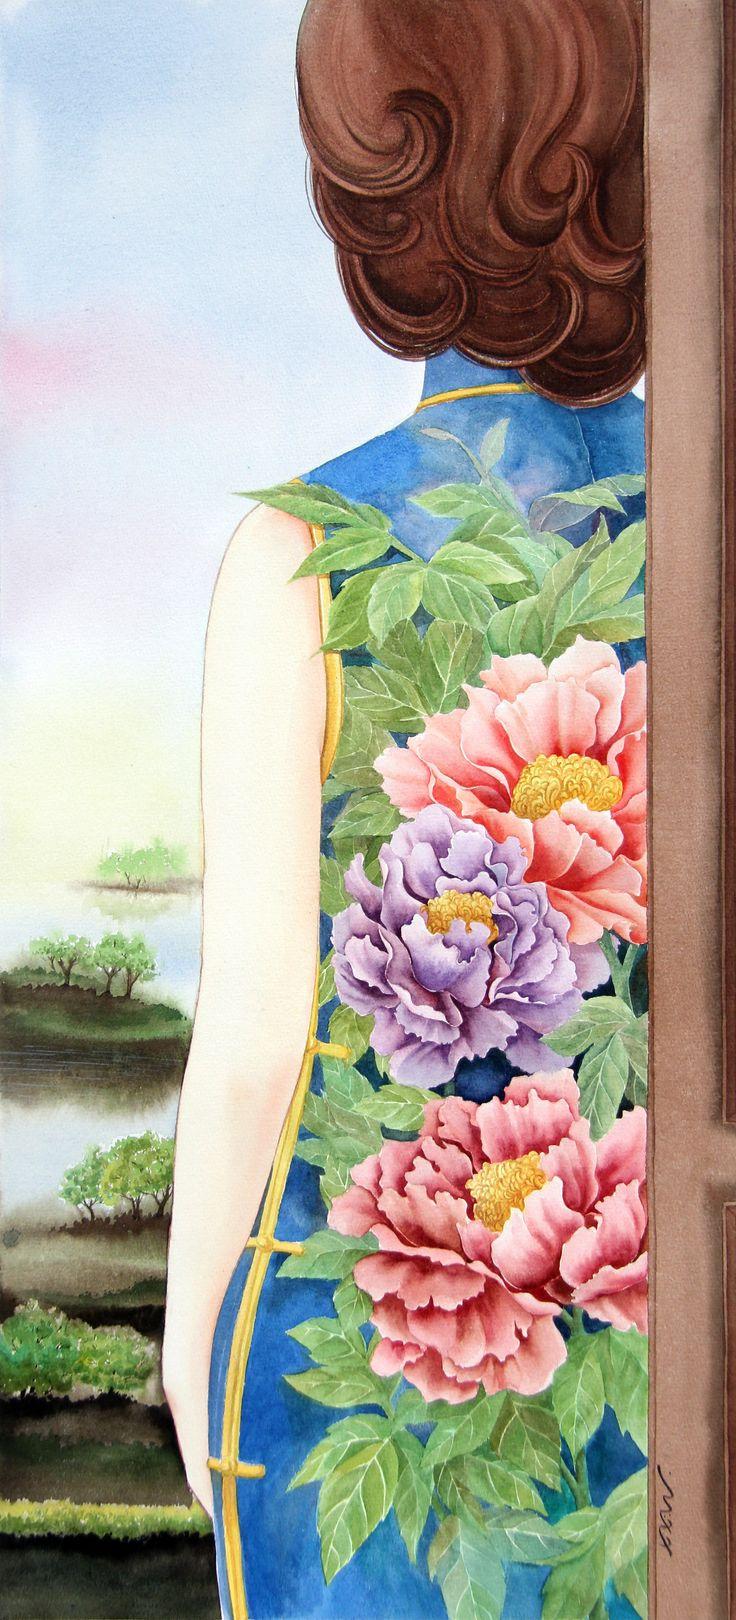 Driade con Qipao. 29cm x 73cm http://www.xixiwang.it/portfolio/driade-con-qipao/